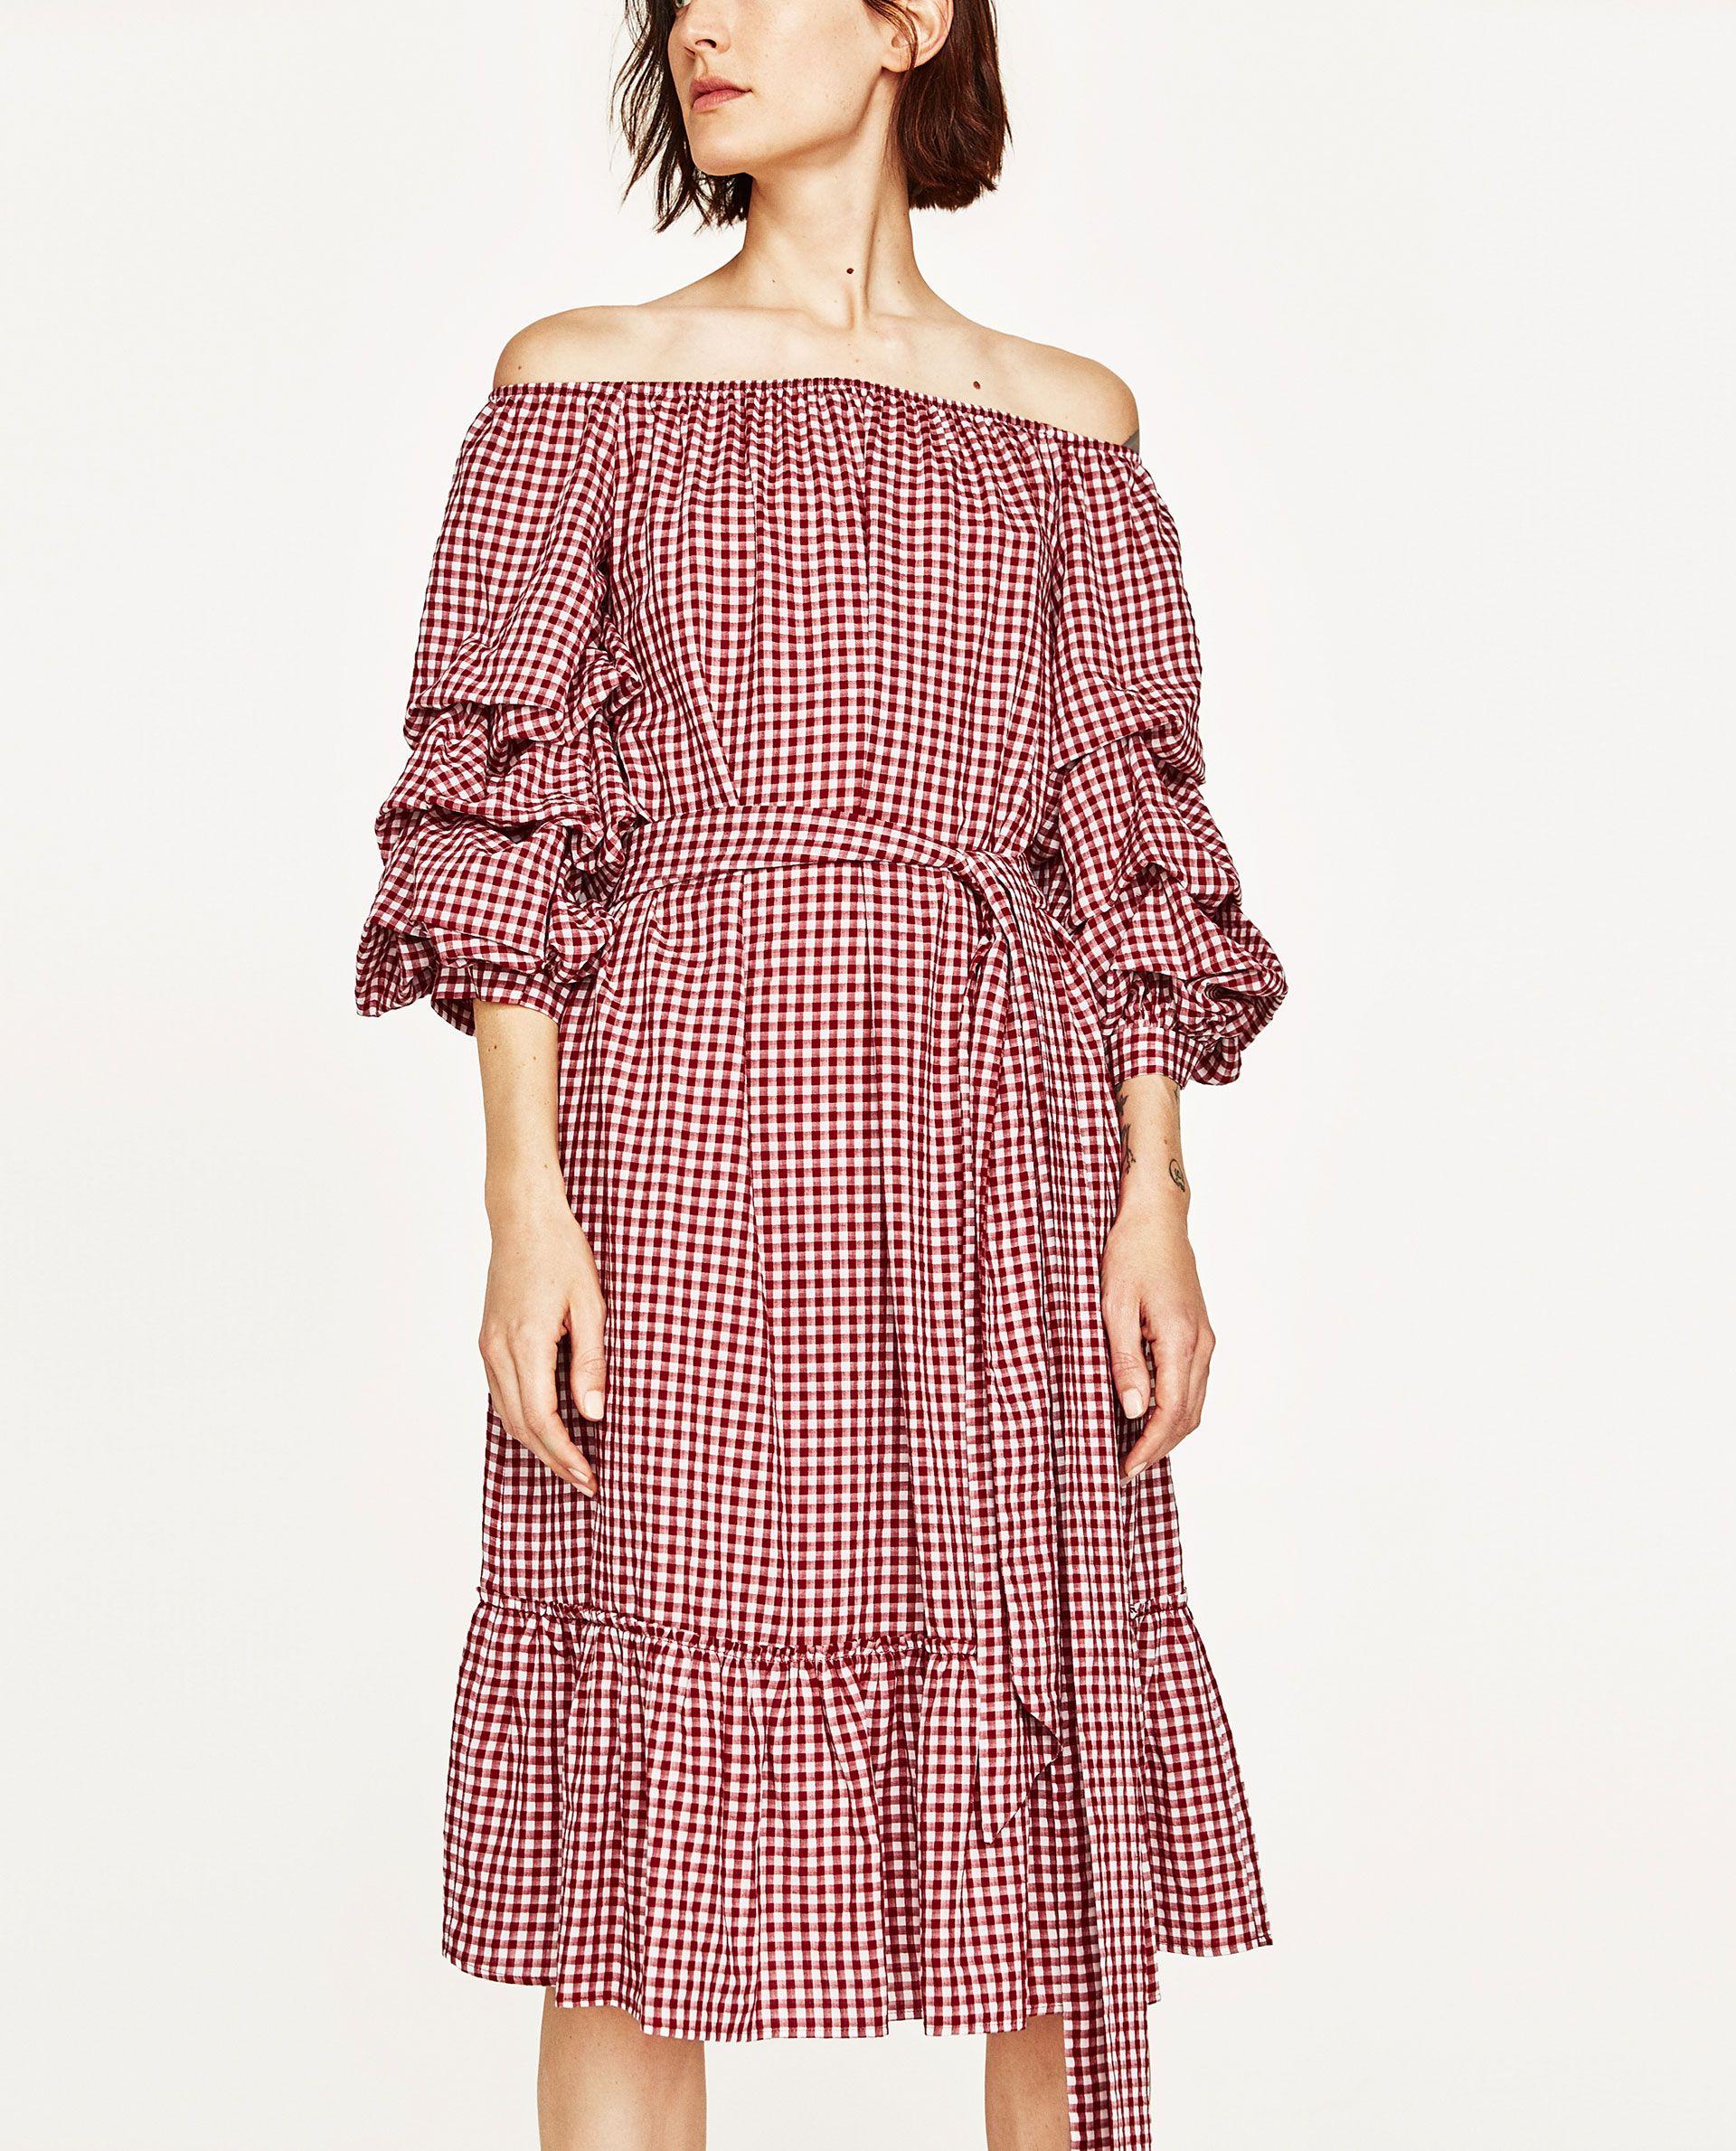 GINGHAM DRESS WITH RUFFLED SLEEVES  Looks vestidos, Vestidos